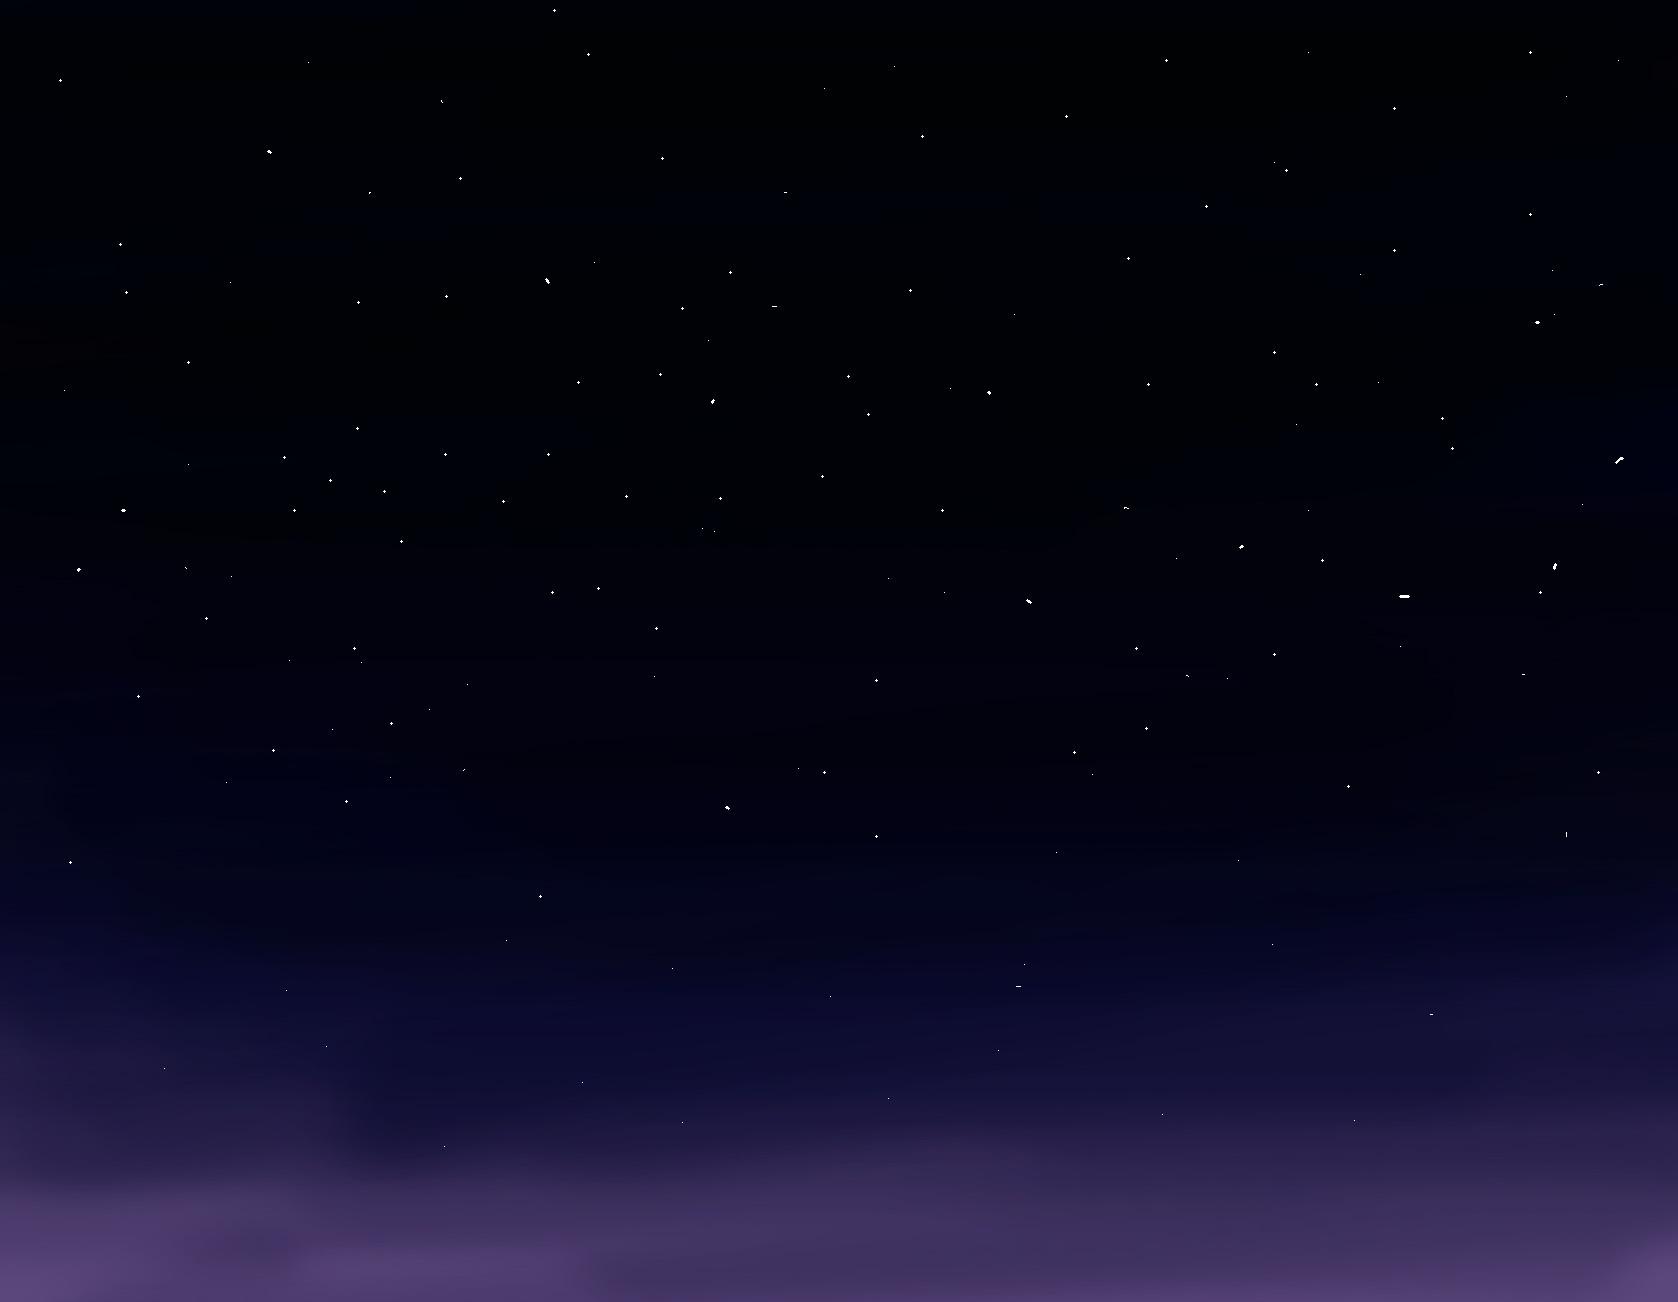 Starry Night Sky Background by 1AnimeAddict1 on deviantART 1678x1302